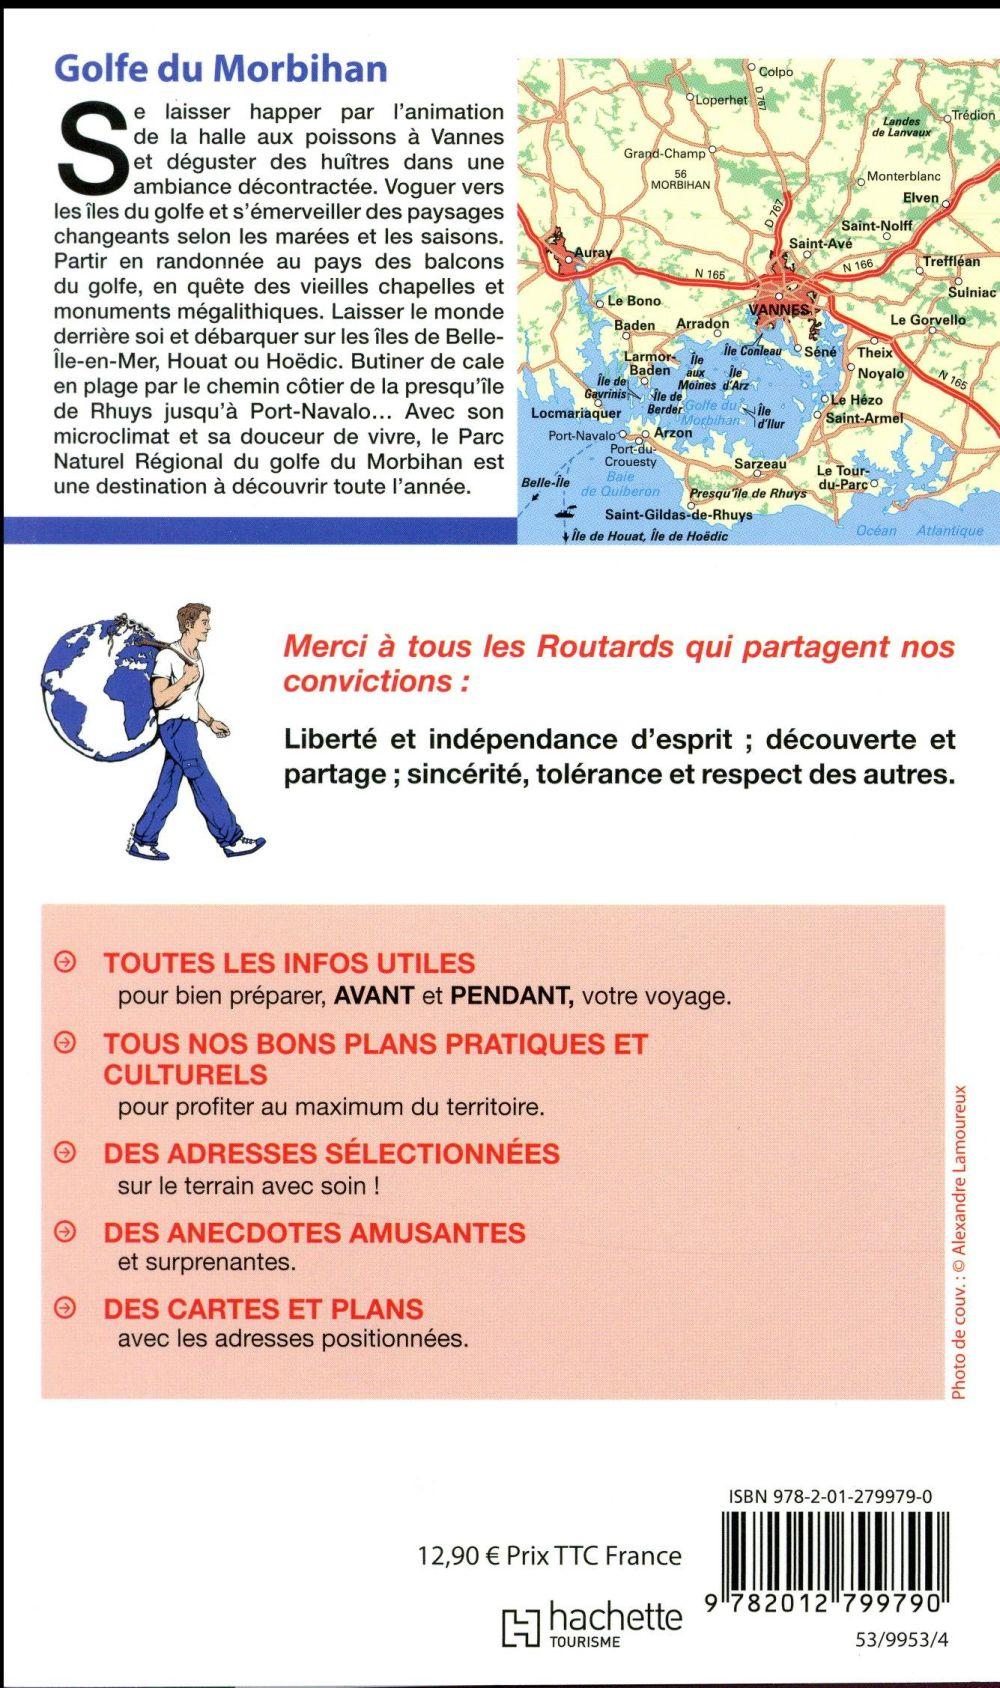 Guide du Routard ; Golfe du Morbihan